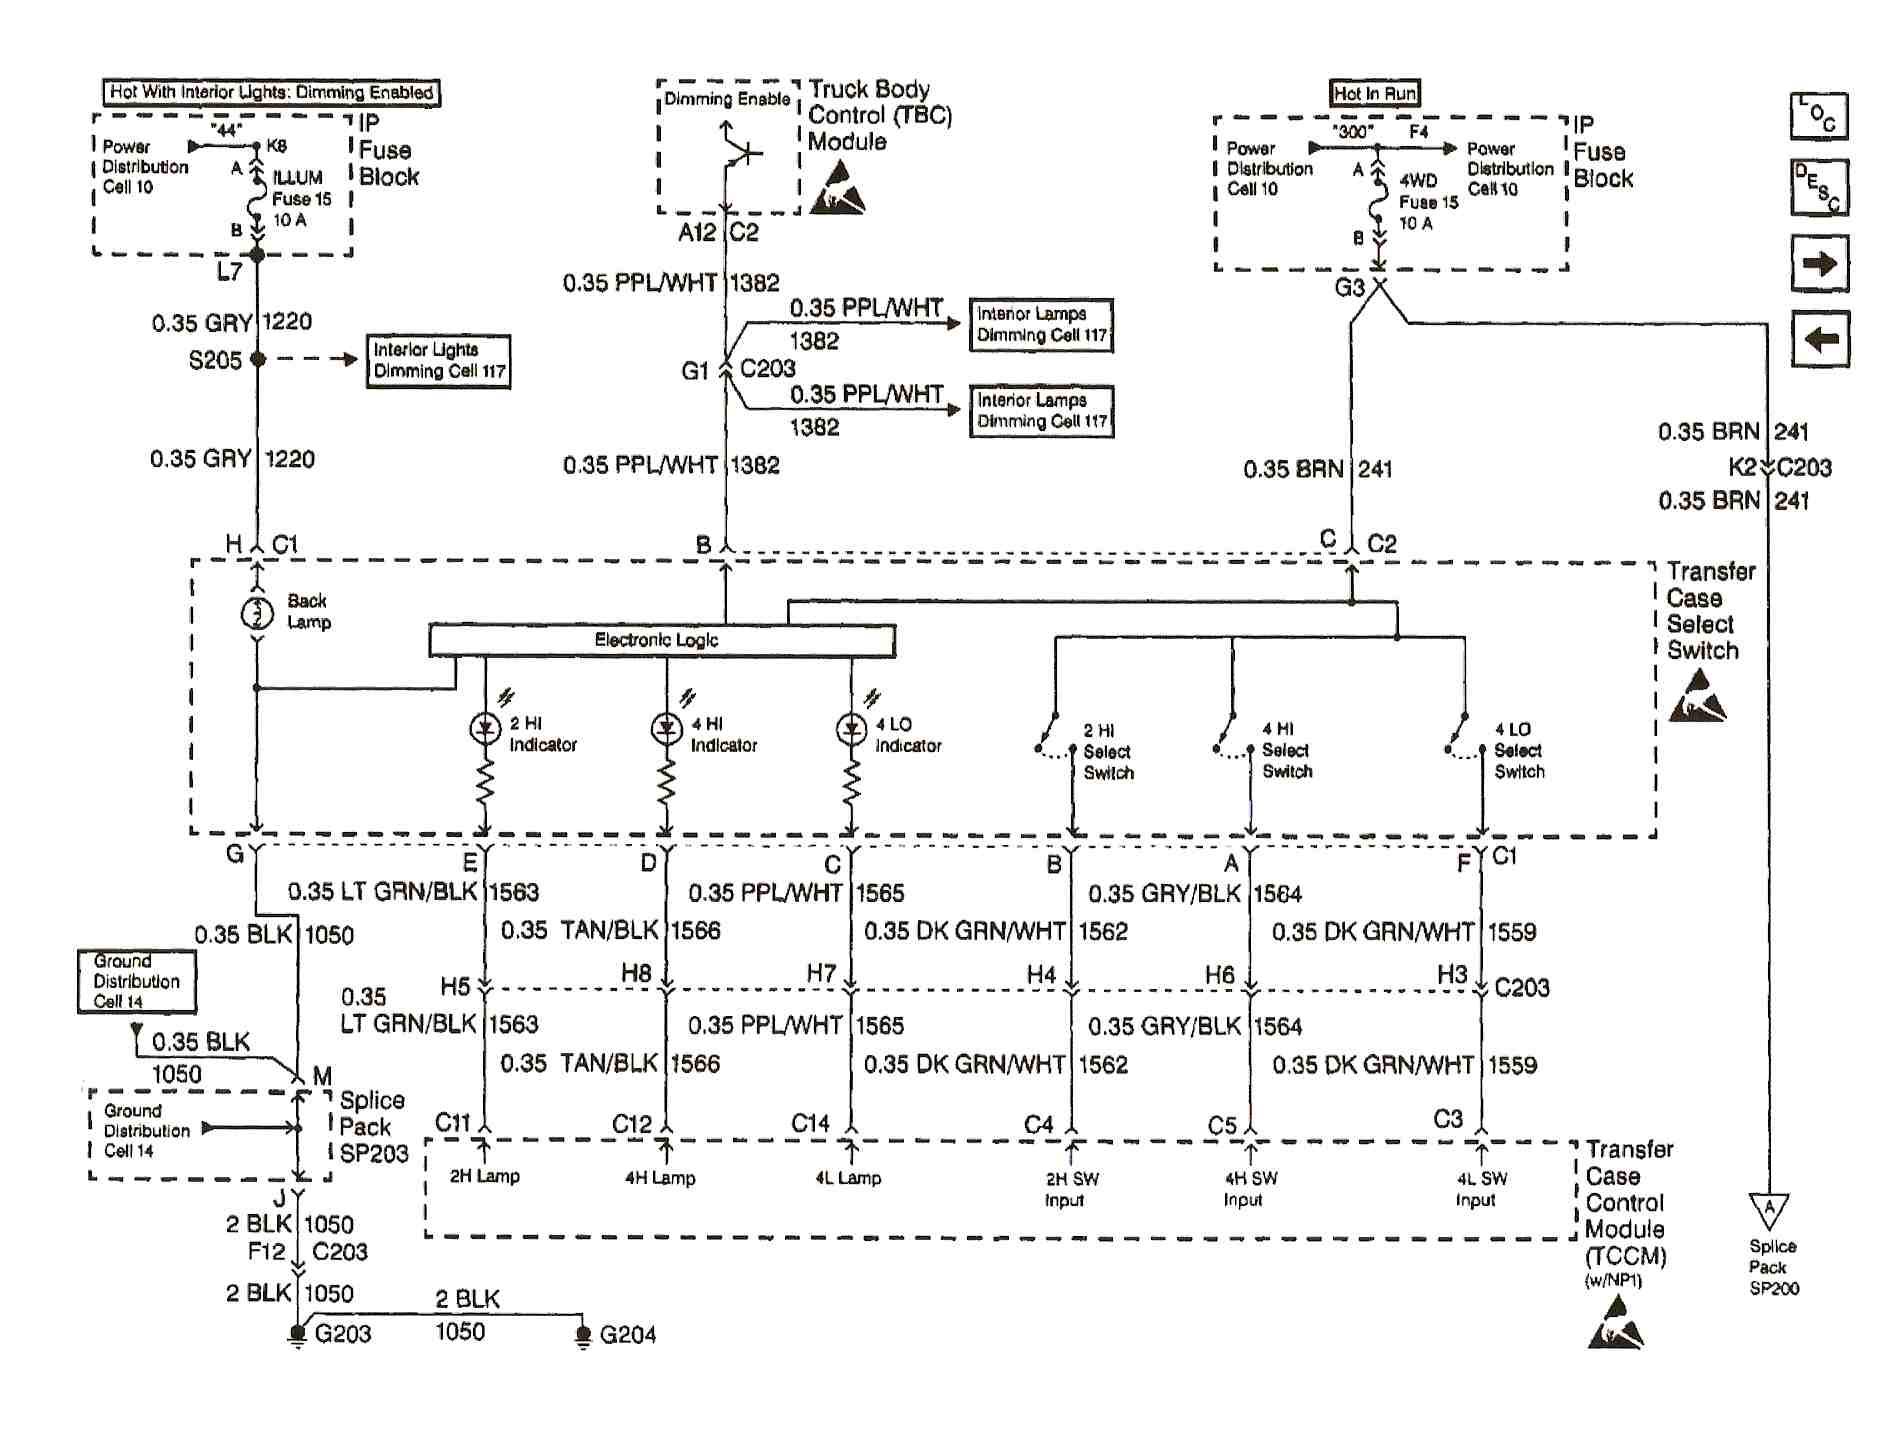 98 Blazer Transfer Case Wiring Diagram Question About Wire 2005 Data Schema Rh 26 Danielmeidl De 4l60e